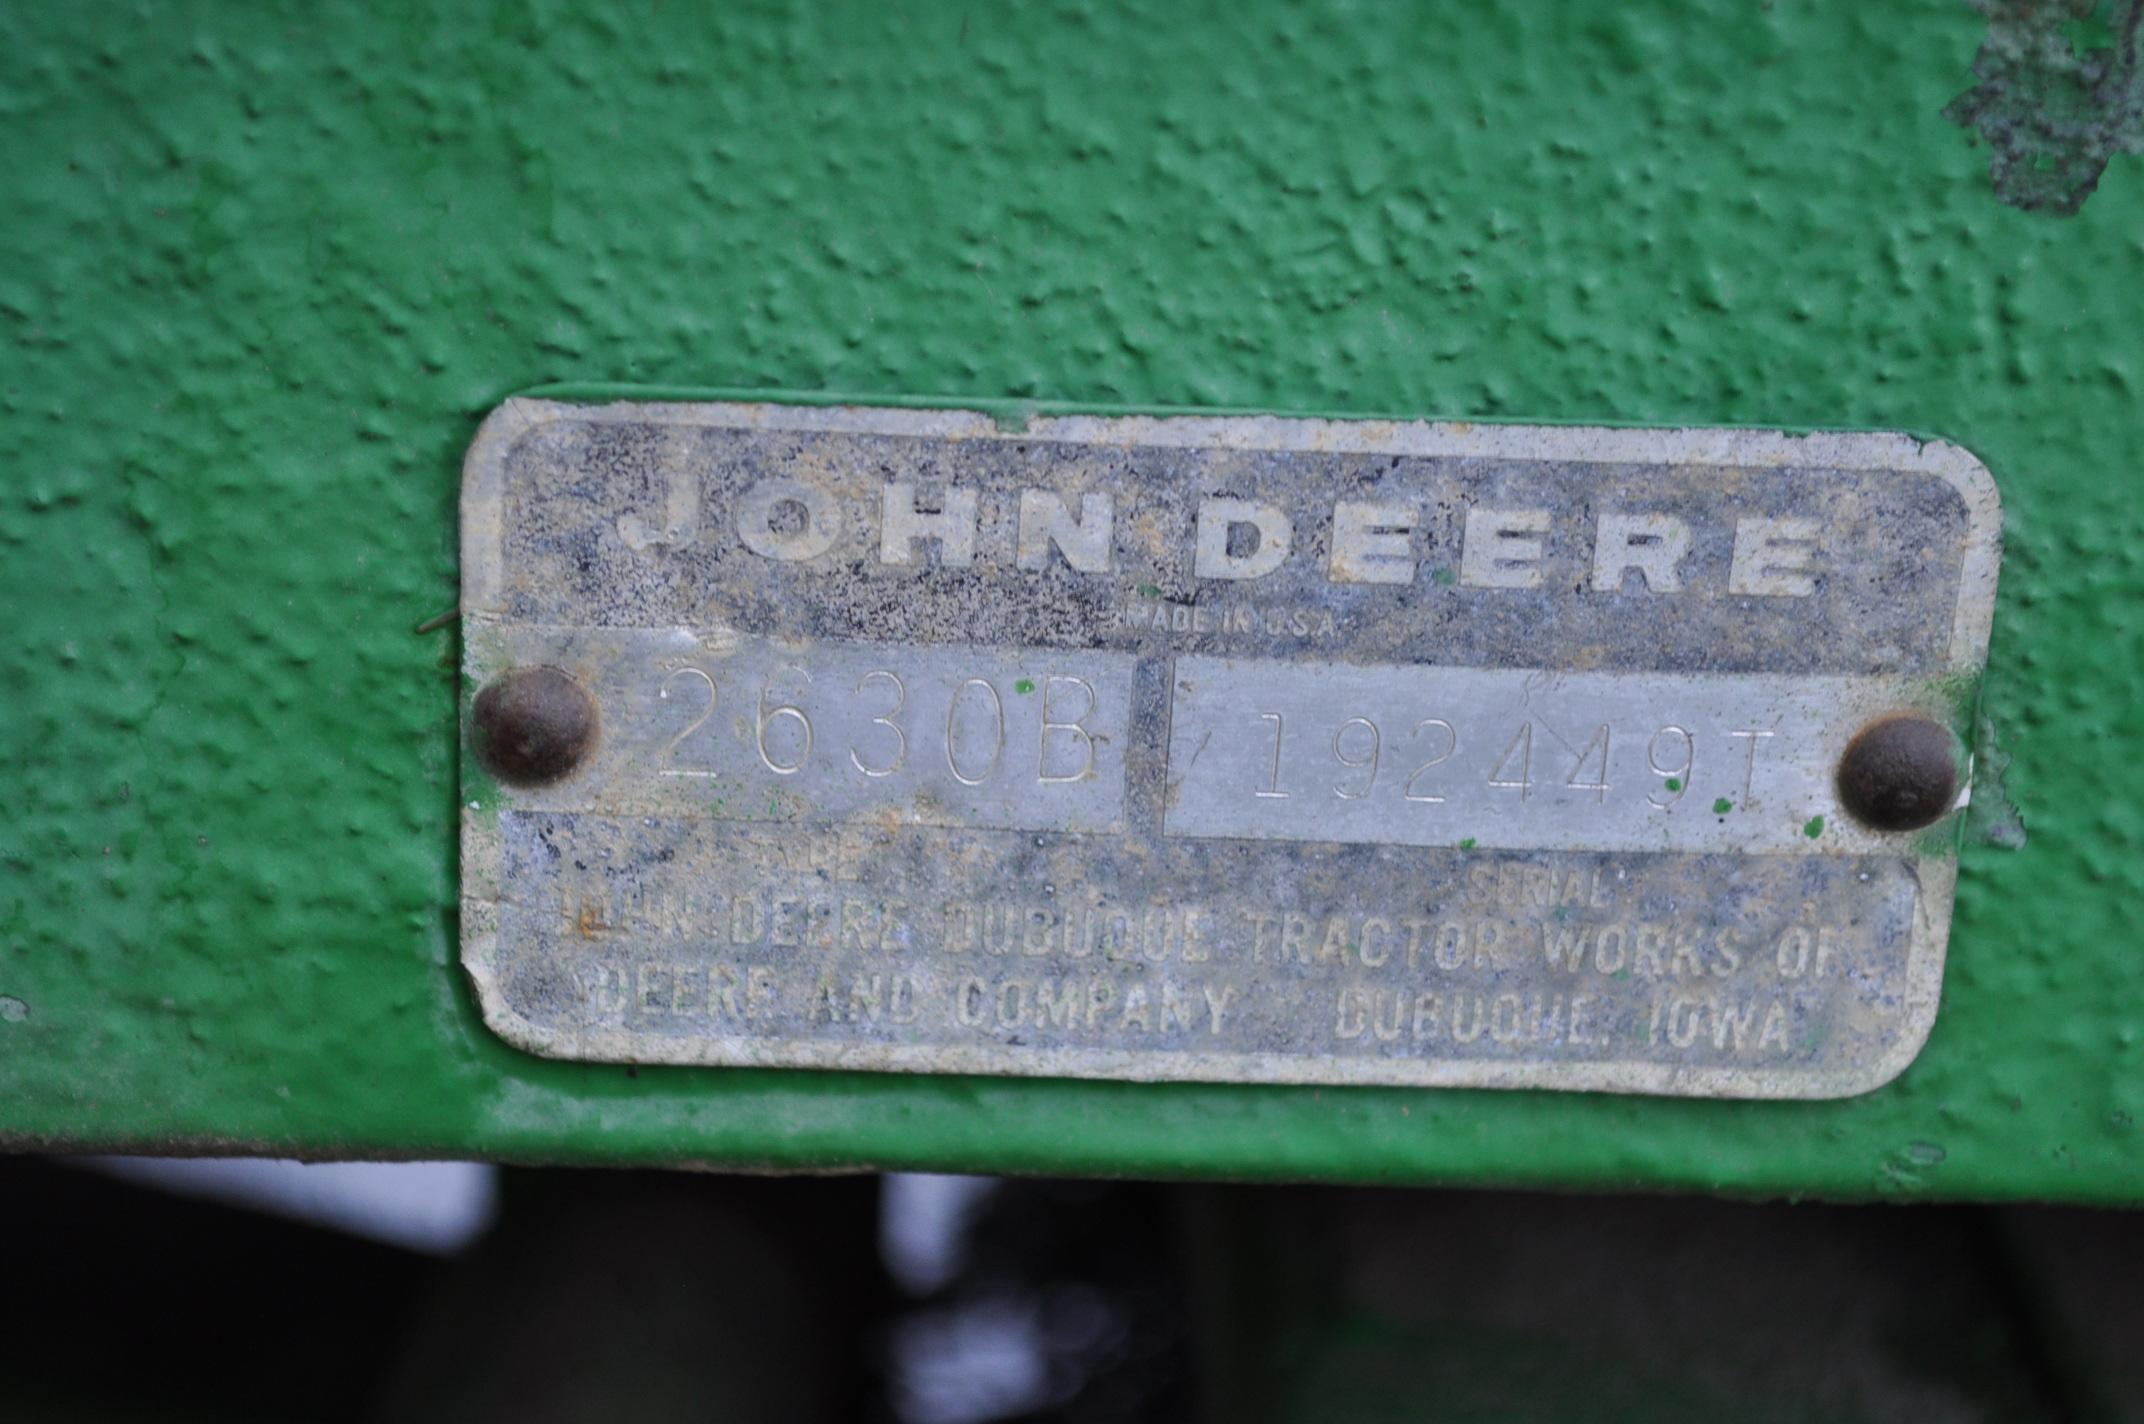 John Deere 2630 tractor, diesel, 16.9-28 rear, 9.5-15 front, 1 hyd remote, 540 pto, 3 pt, 4260 - Image 9 of 18